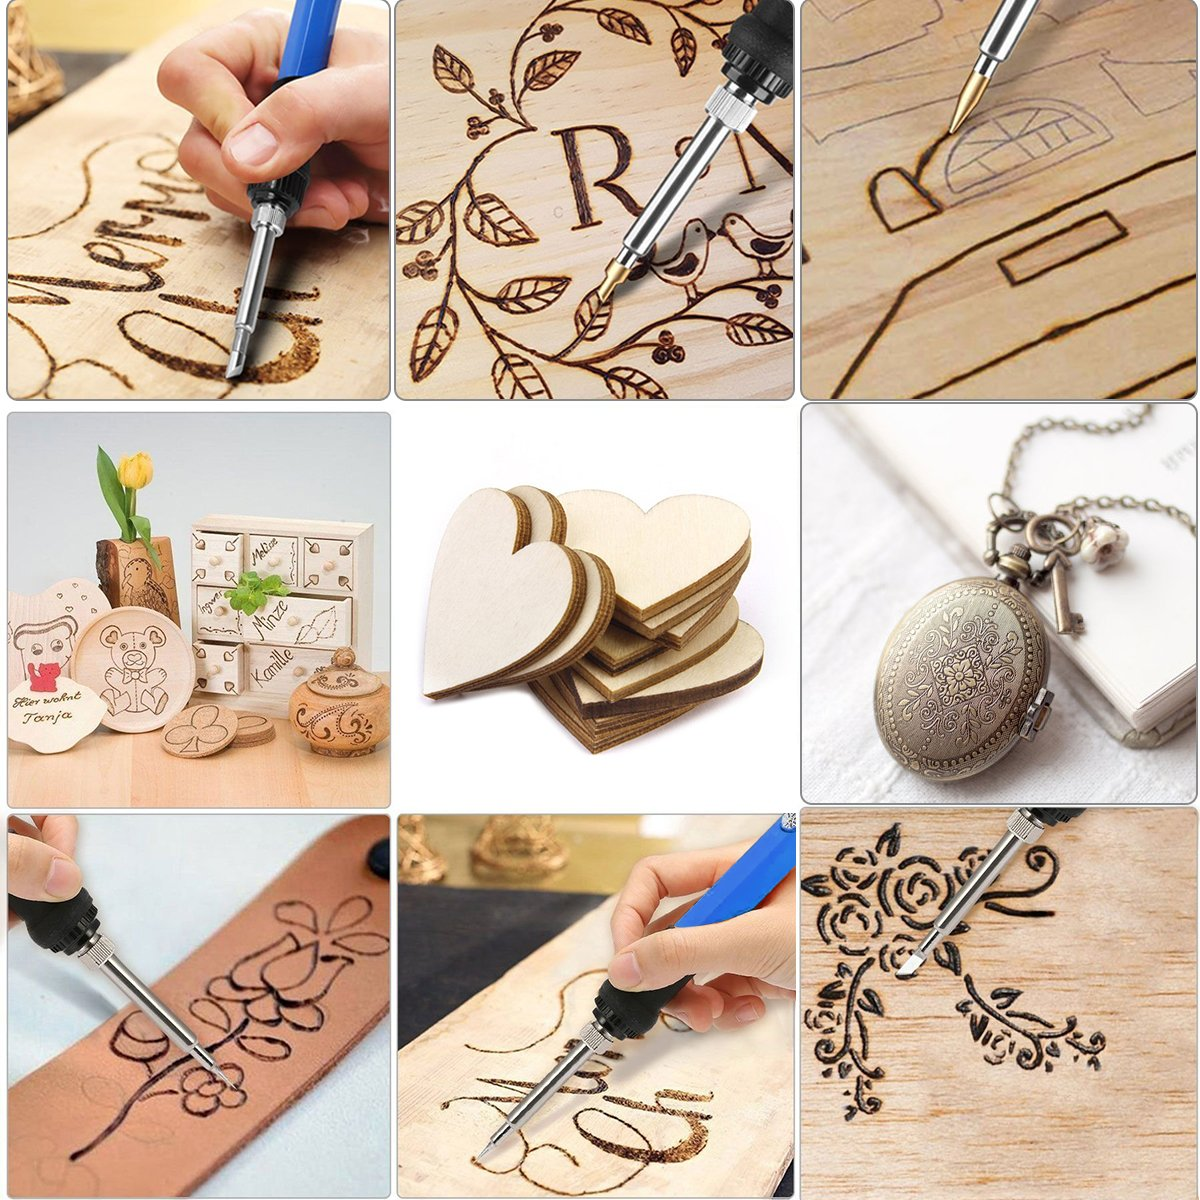 Preciva 37PCS Pyrography Iron Kit Wood Craft Tool Set Wood Burning Pen for Carving Wood Burning Kit